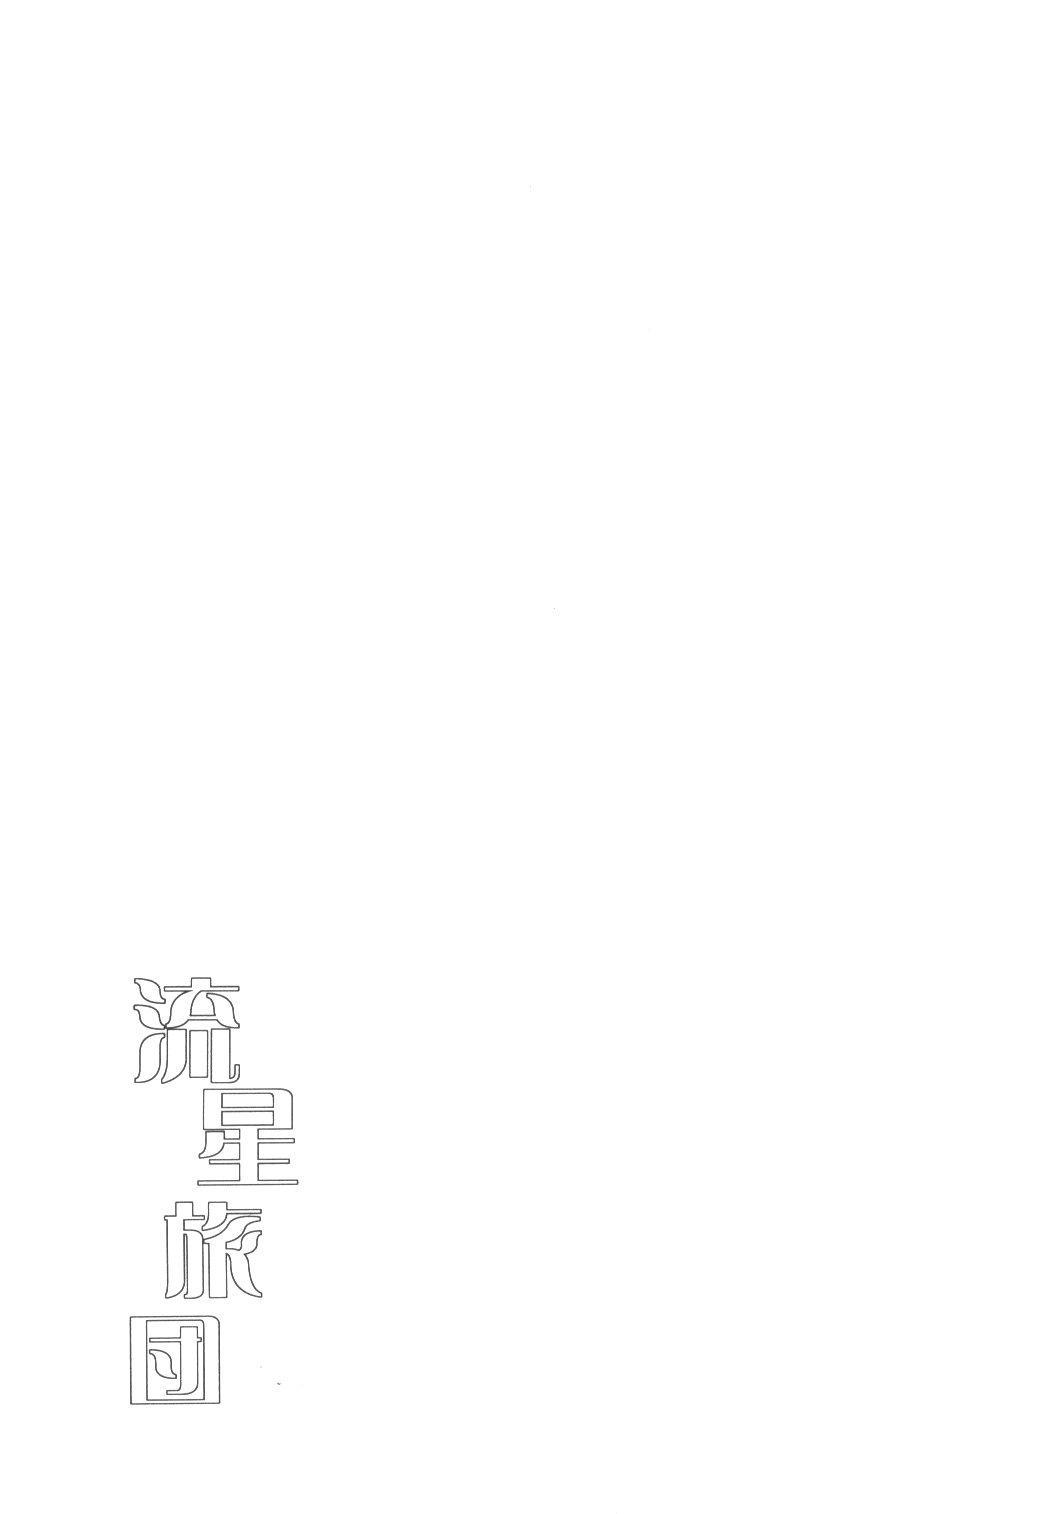 Ryuusei Ryodan 50